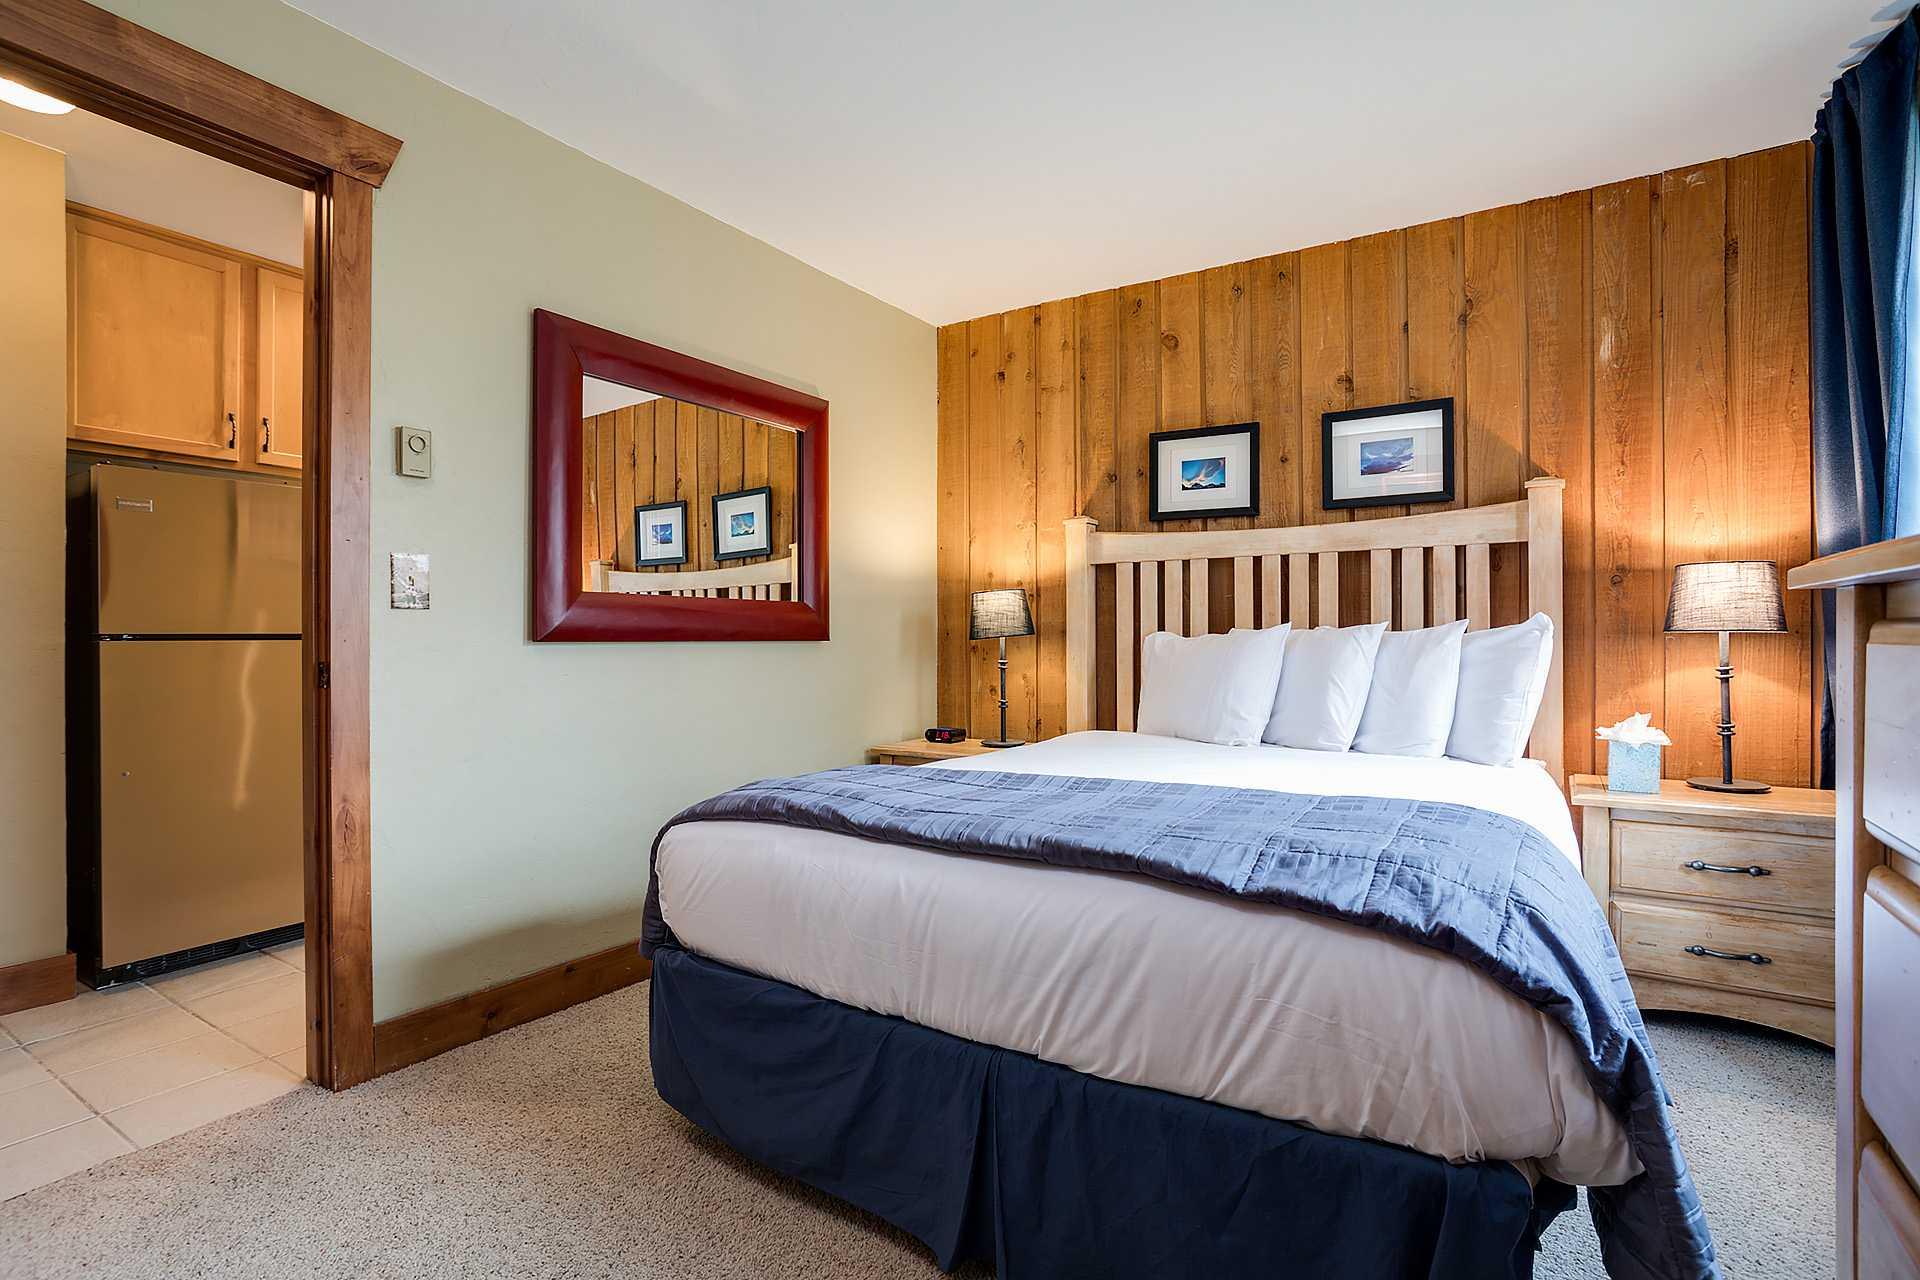 SL206 - Scandinavian Lodge and Condominiums